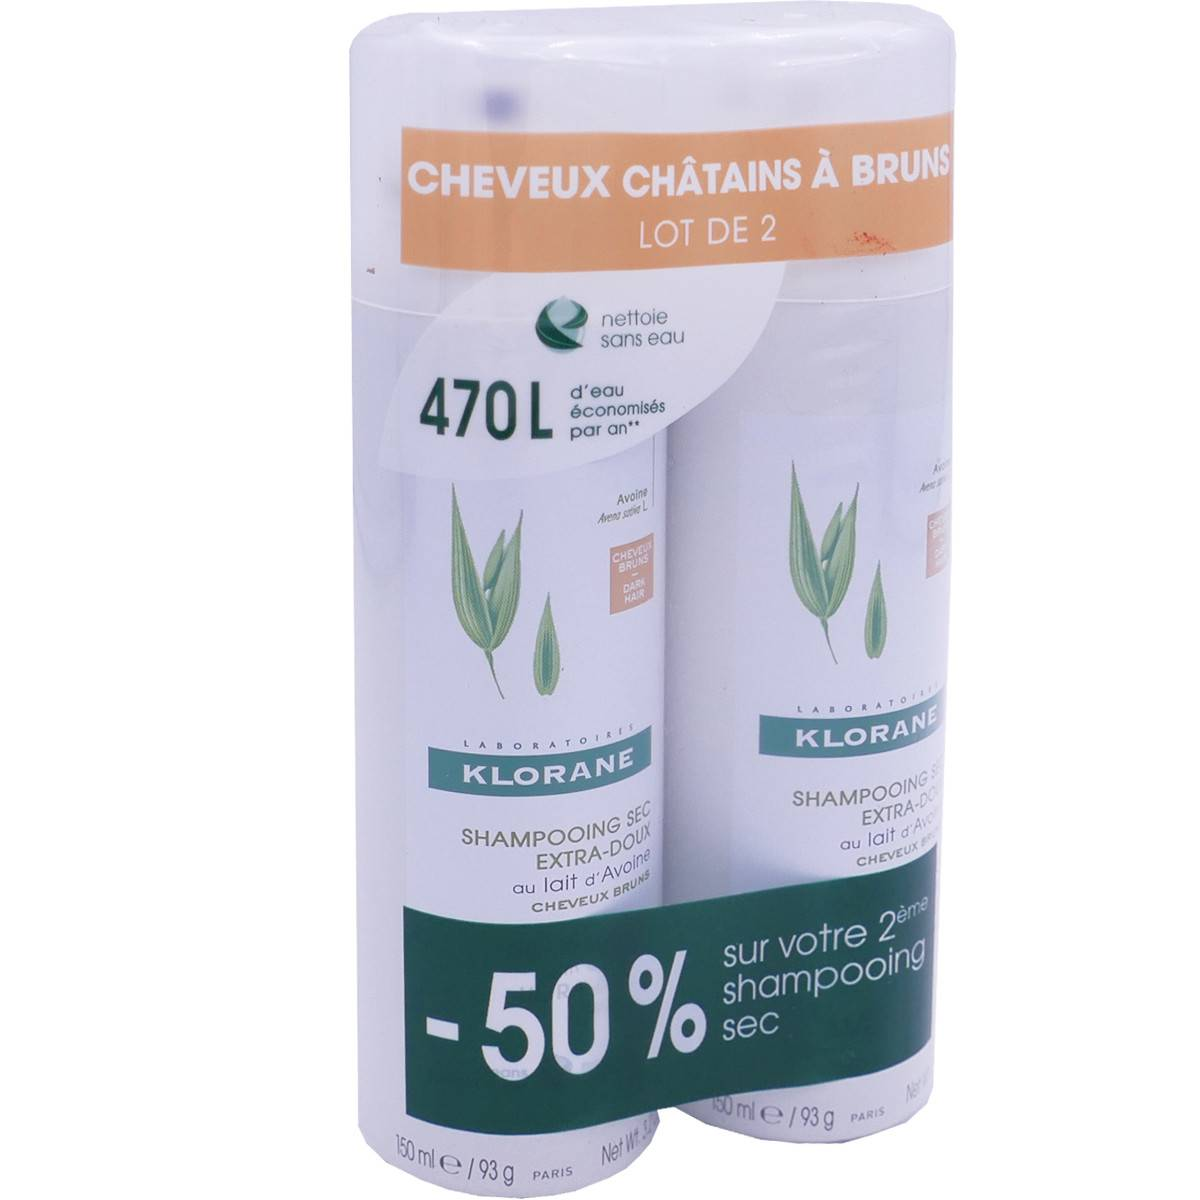 Klorane shampooing sec 2x 150 ml cheveux chatains a bruns